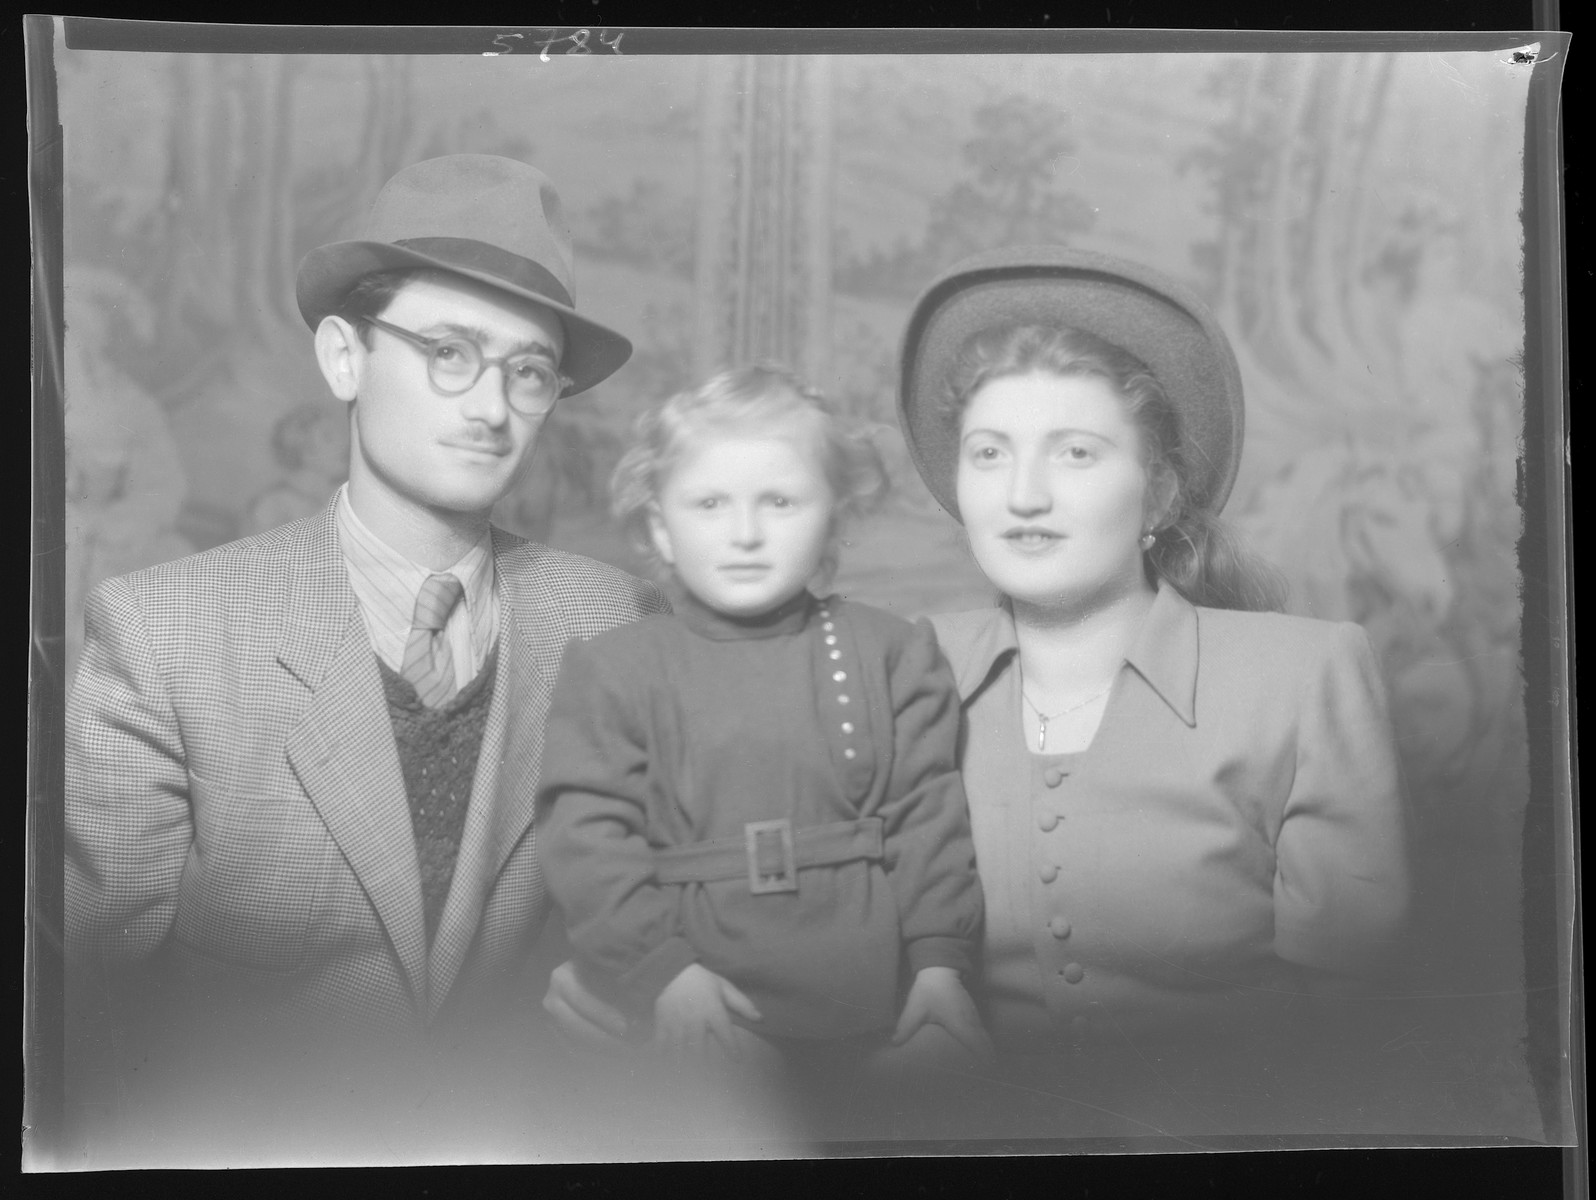 Studio portrait of Samuel Herskovits, his wife and child.